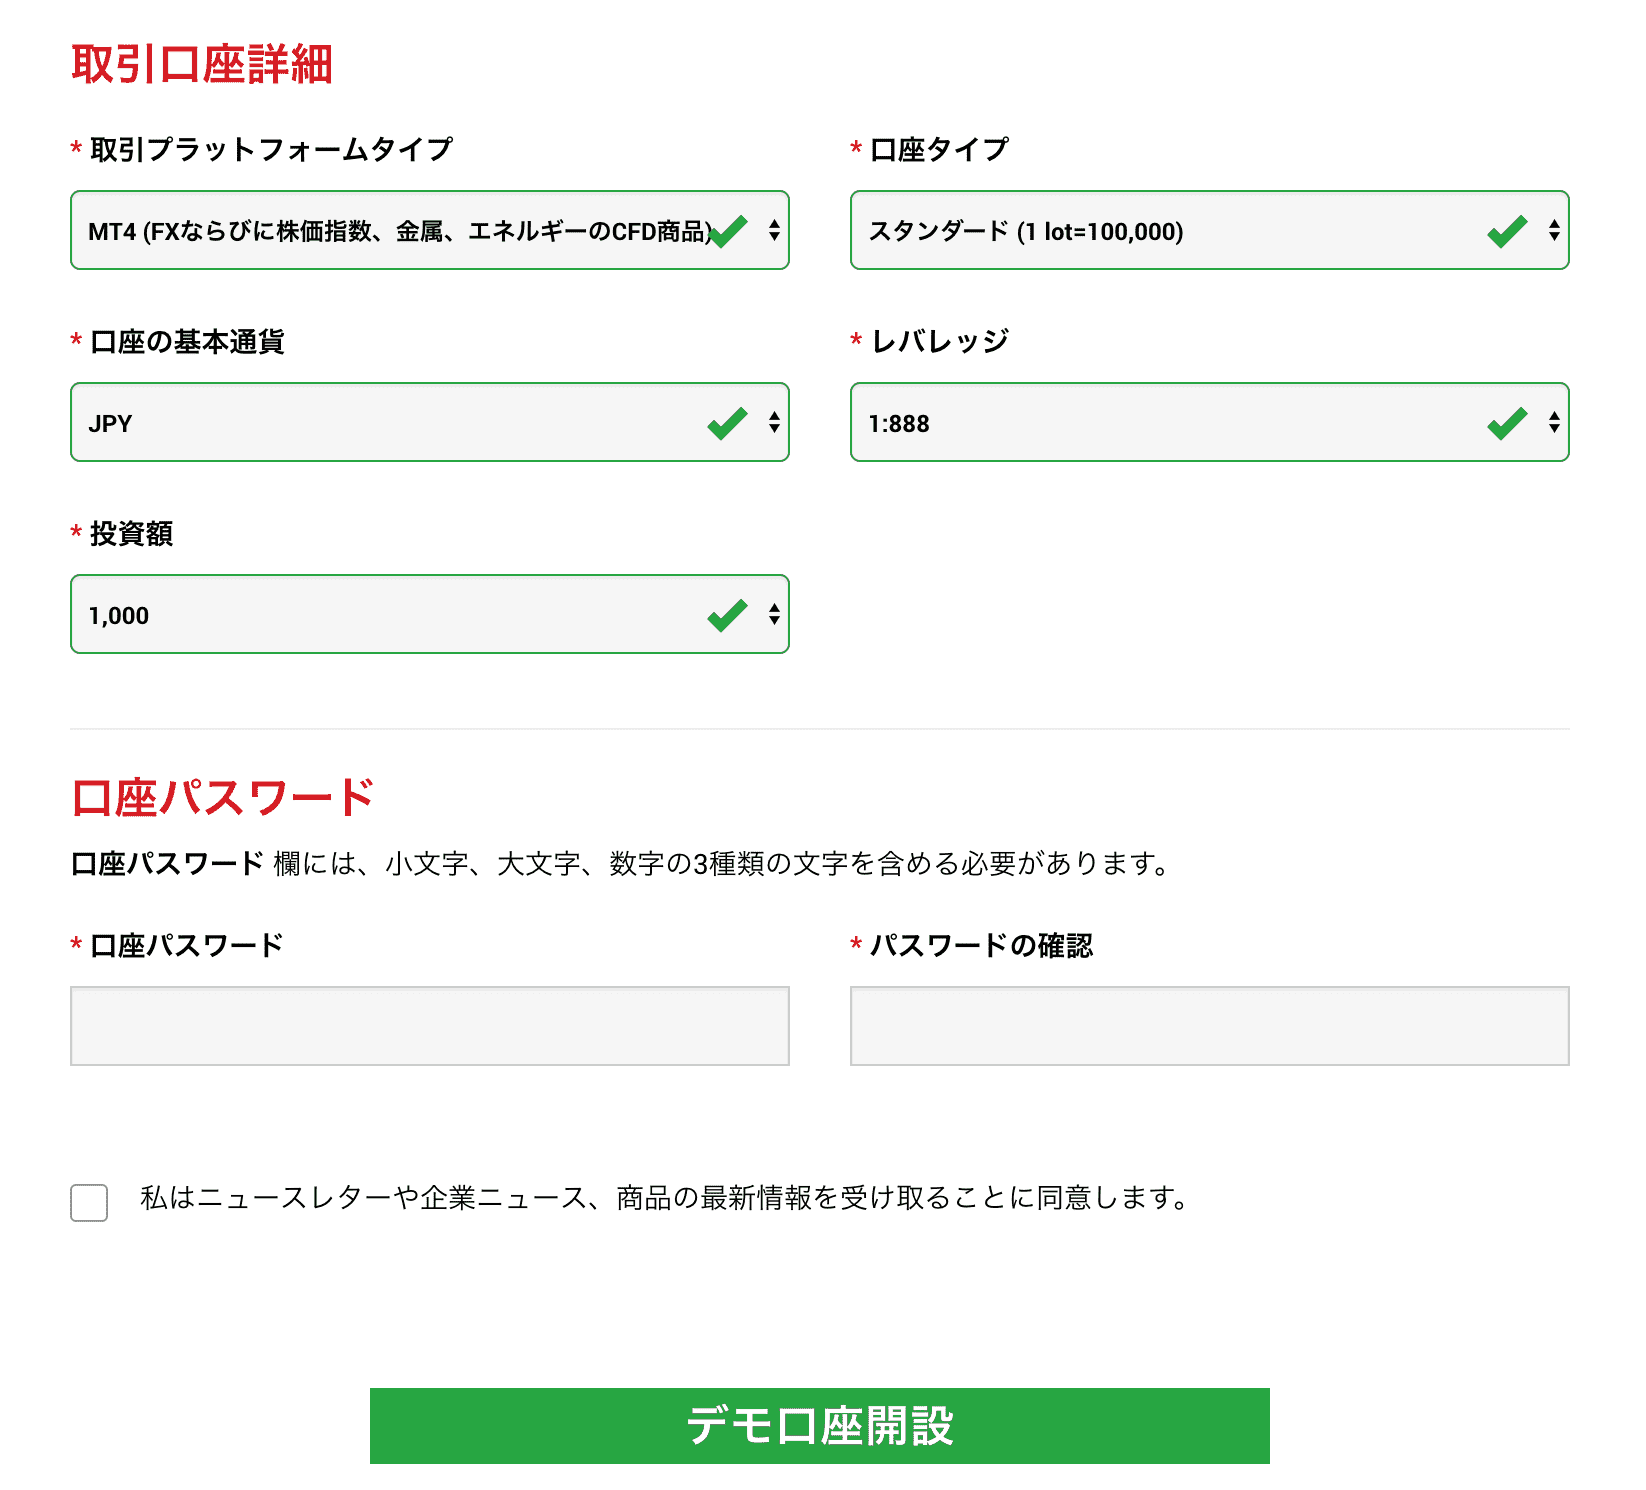 MT4の取引口座詳細画面